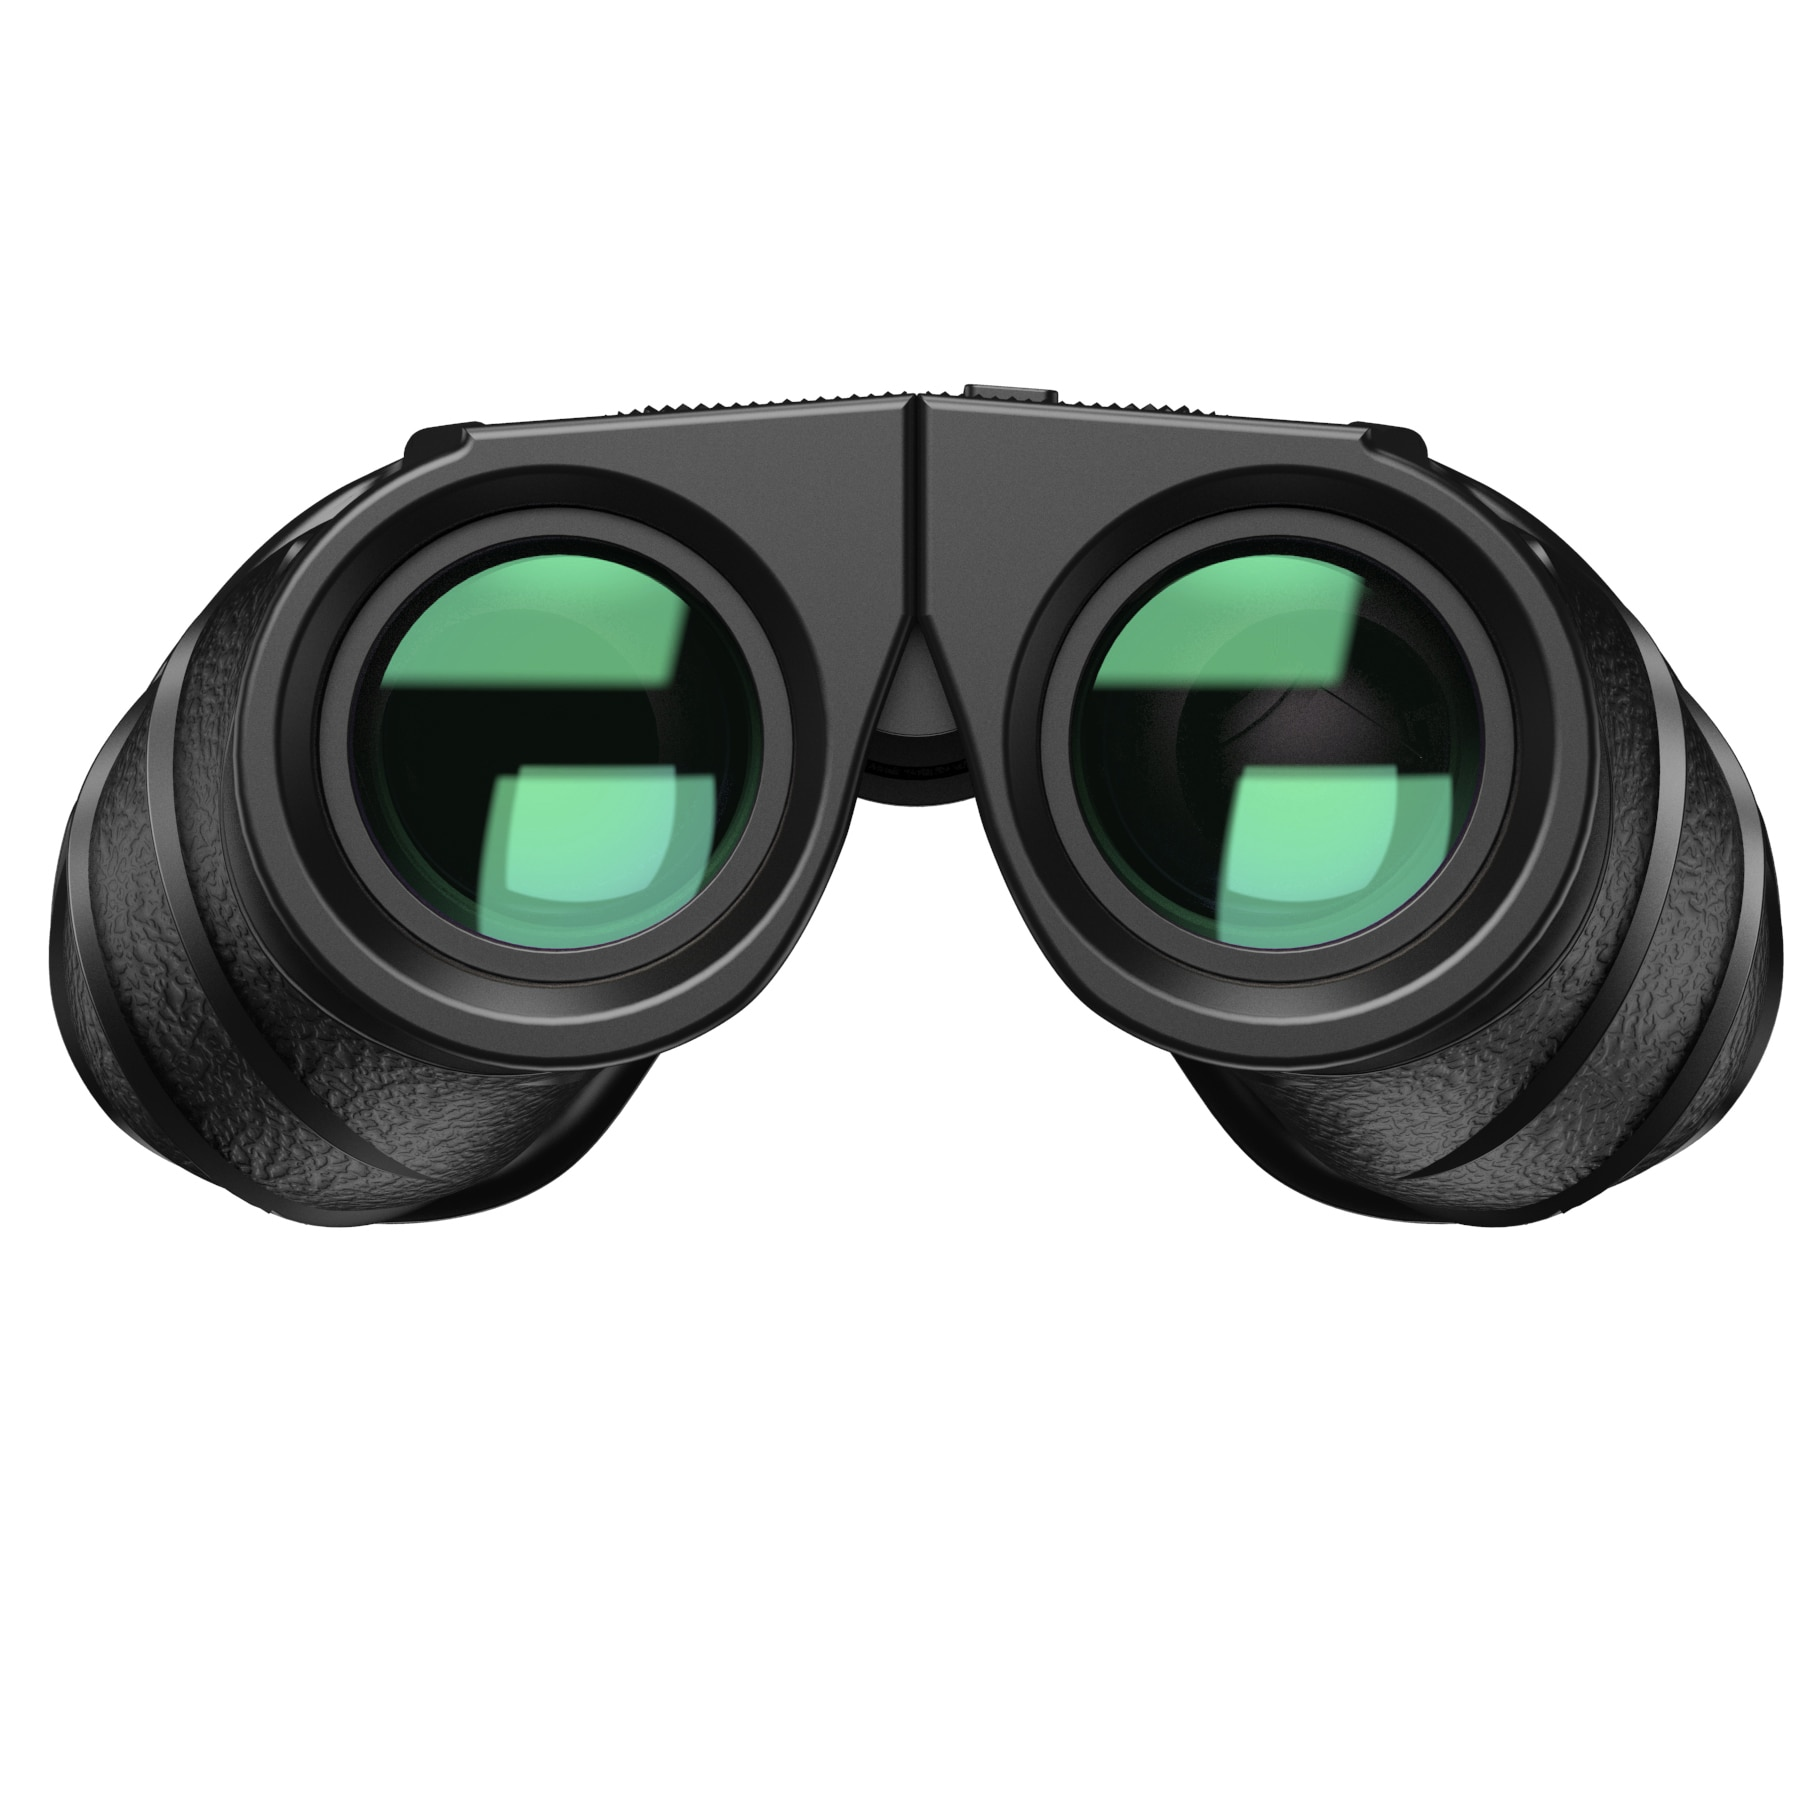 APEXEL HD Telescope 10x25 BAK4 Prism Binoculars High Powered Zoom 114m/1000m Binocular Hunting Telescope for Sport bird-watching